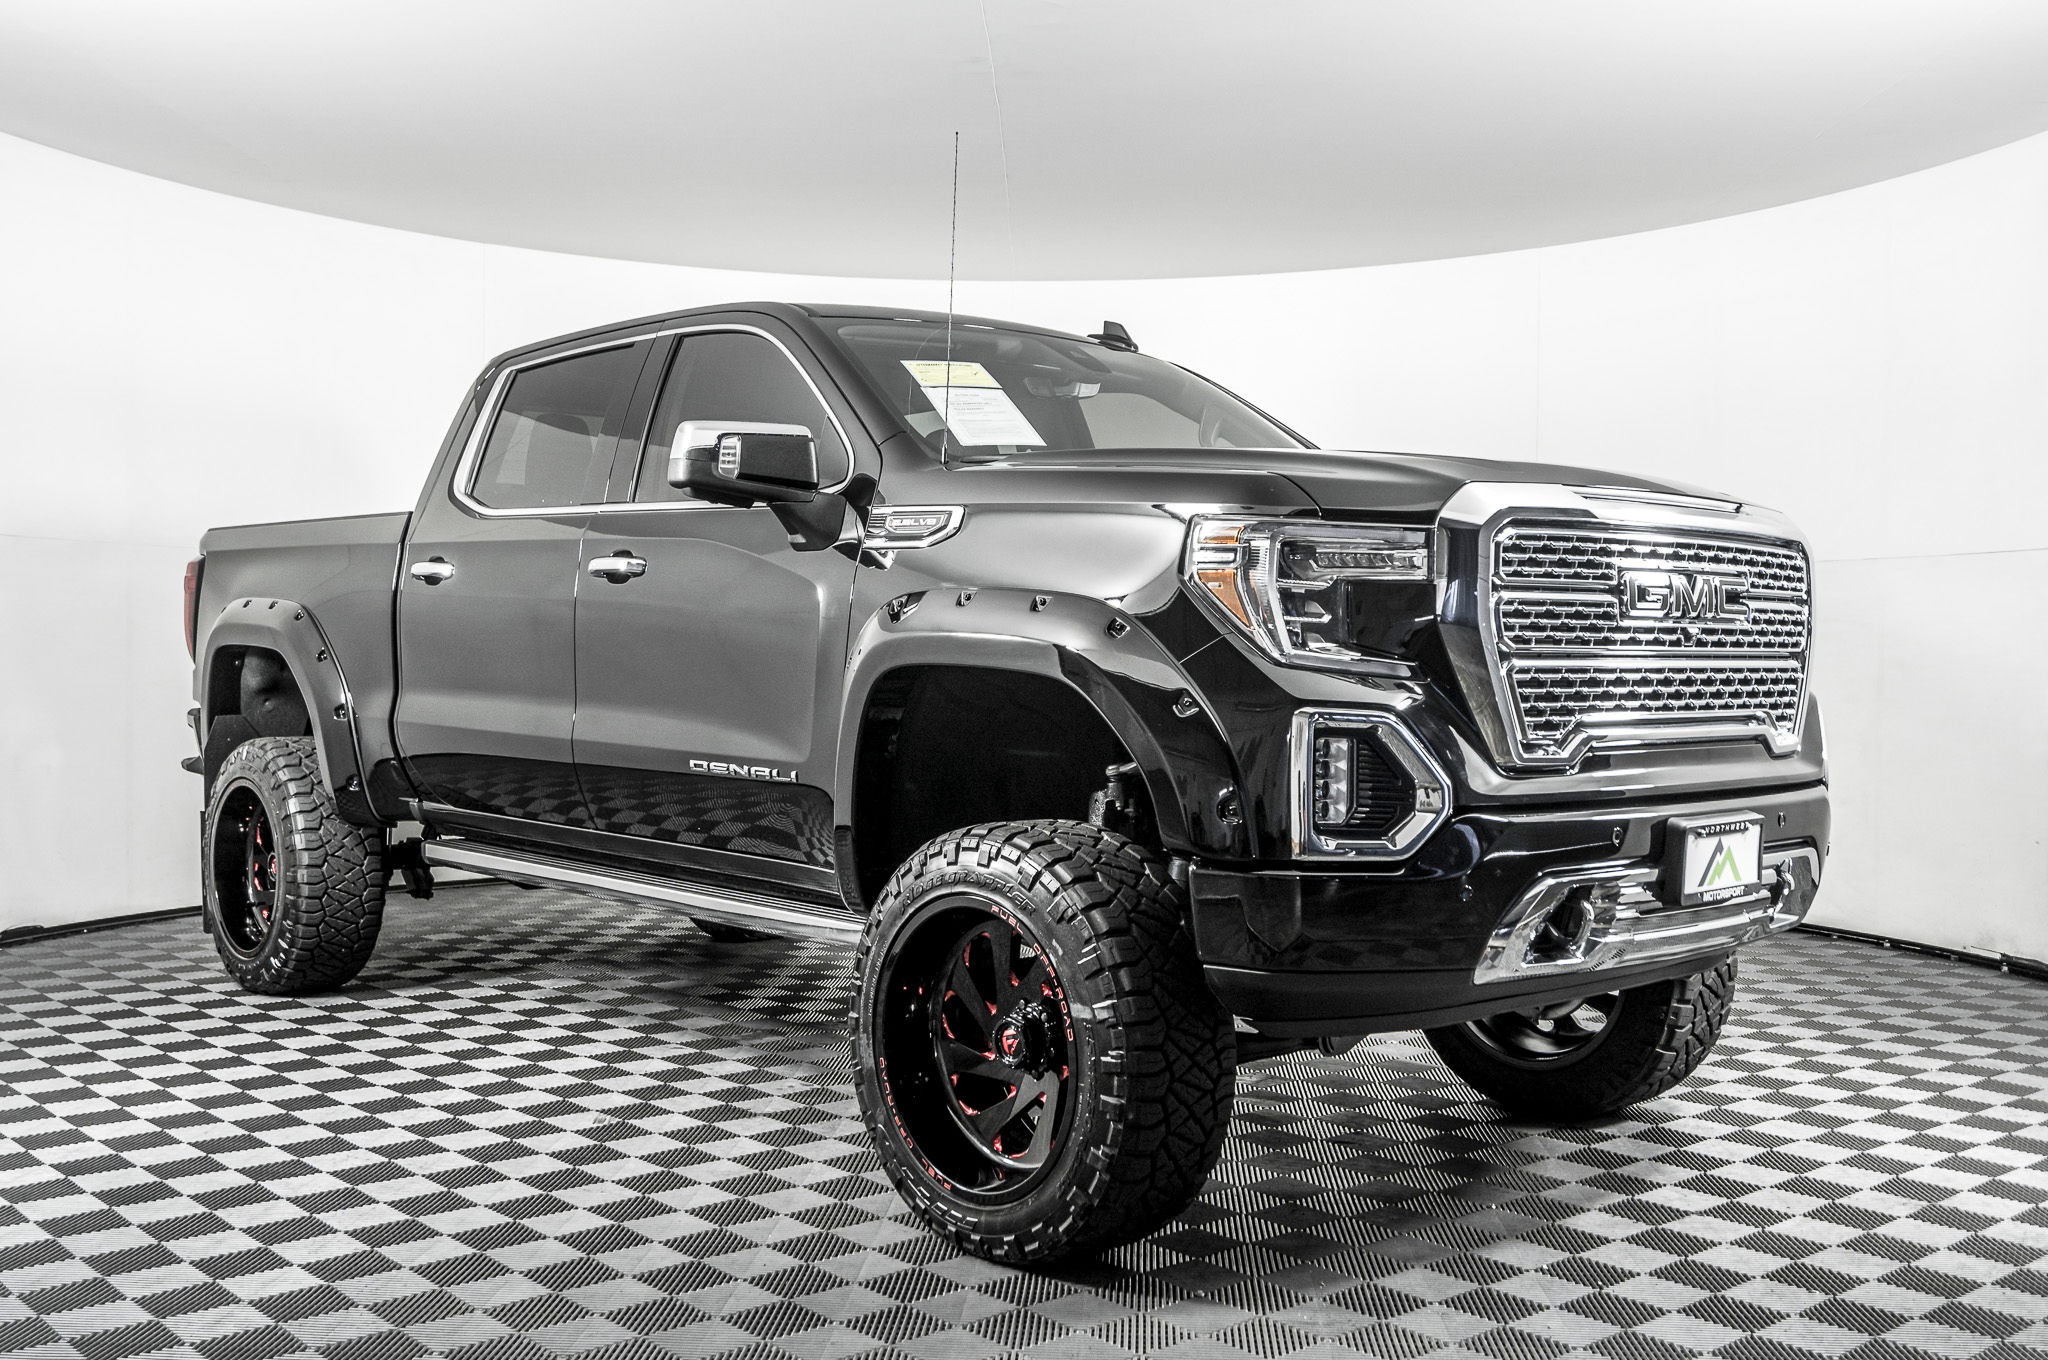 Used Lifted 2019 Gmc Sierra 1500 Denali 4x4 Truck For Sale Northwest Motorsport